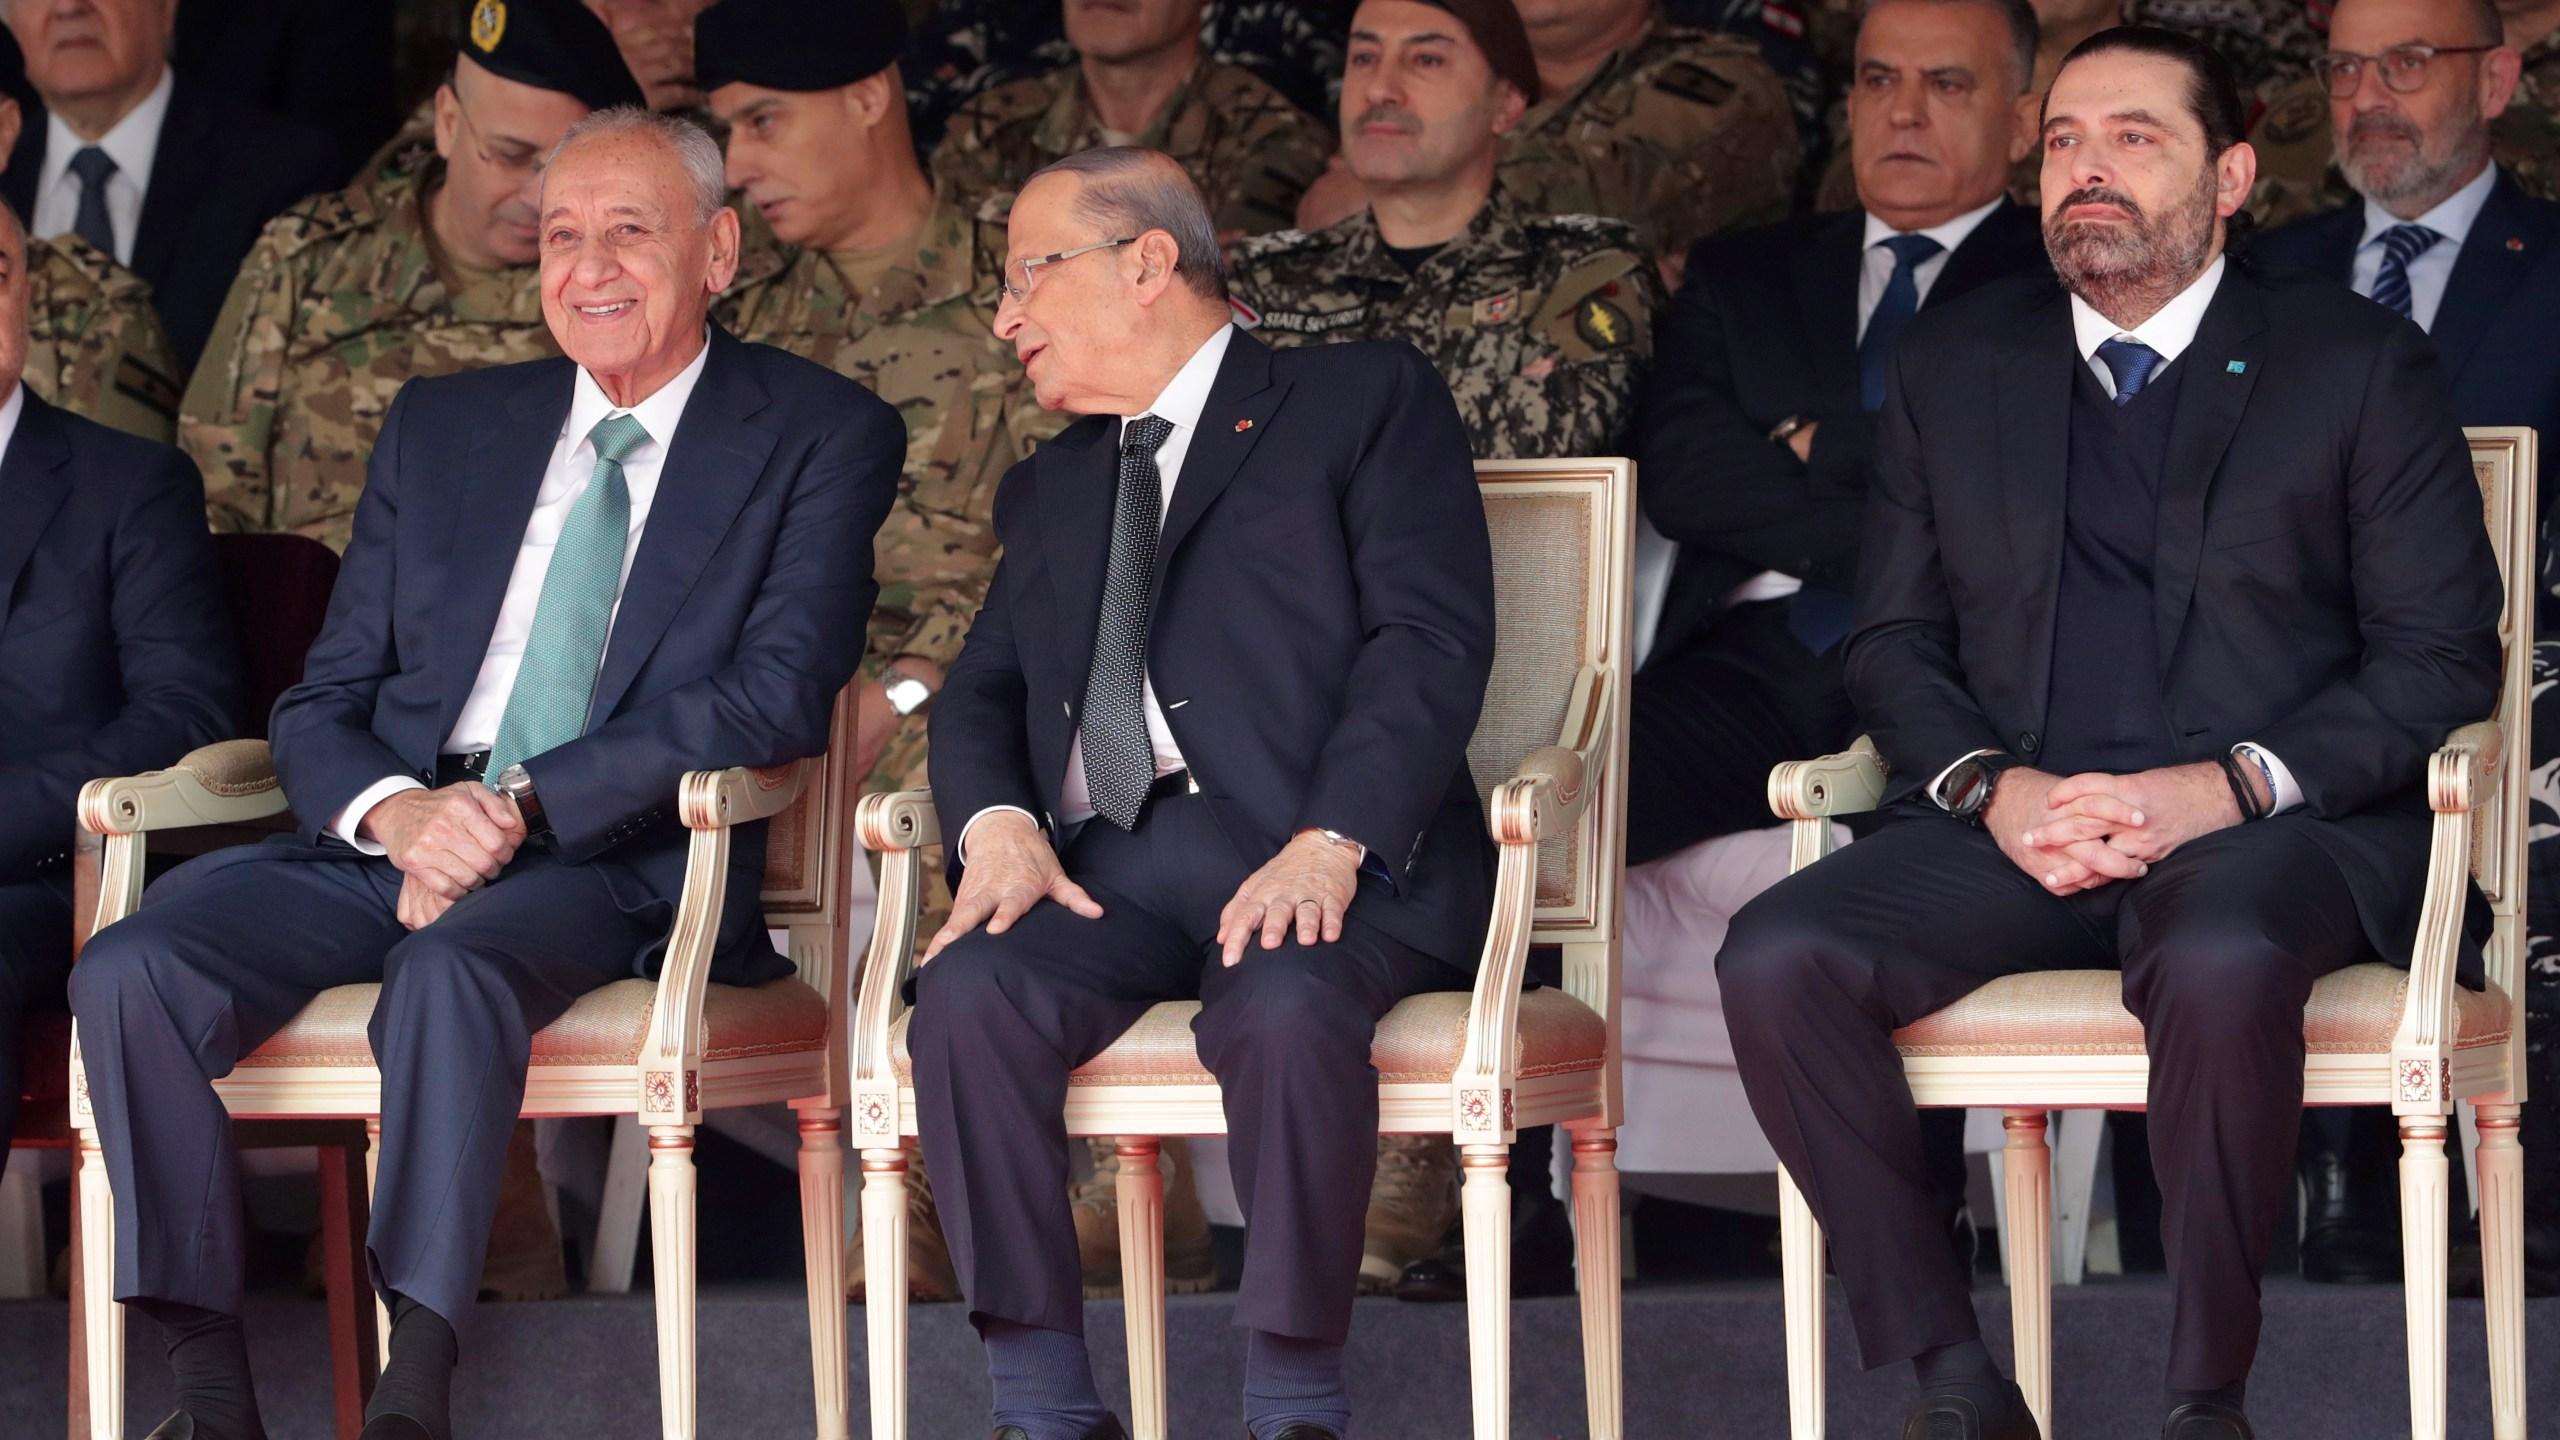 Michel Aoun, Saad Hariri, Nabih Berri